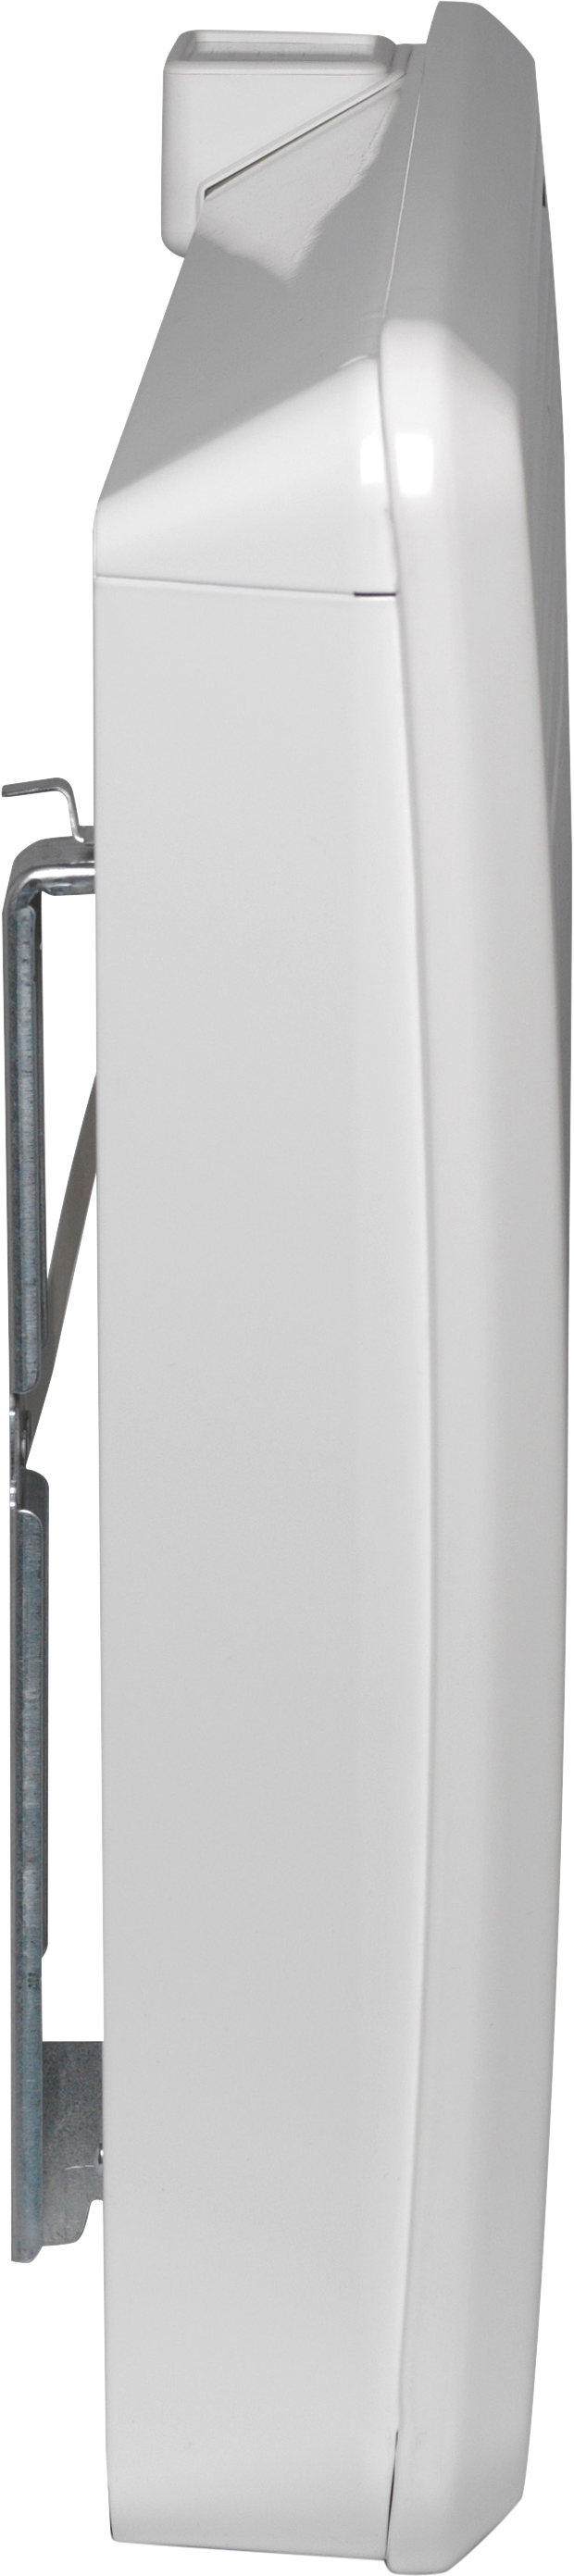 Dimplex Plx200e 2 00kw Panel Heater Lot 20 Compliant W